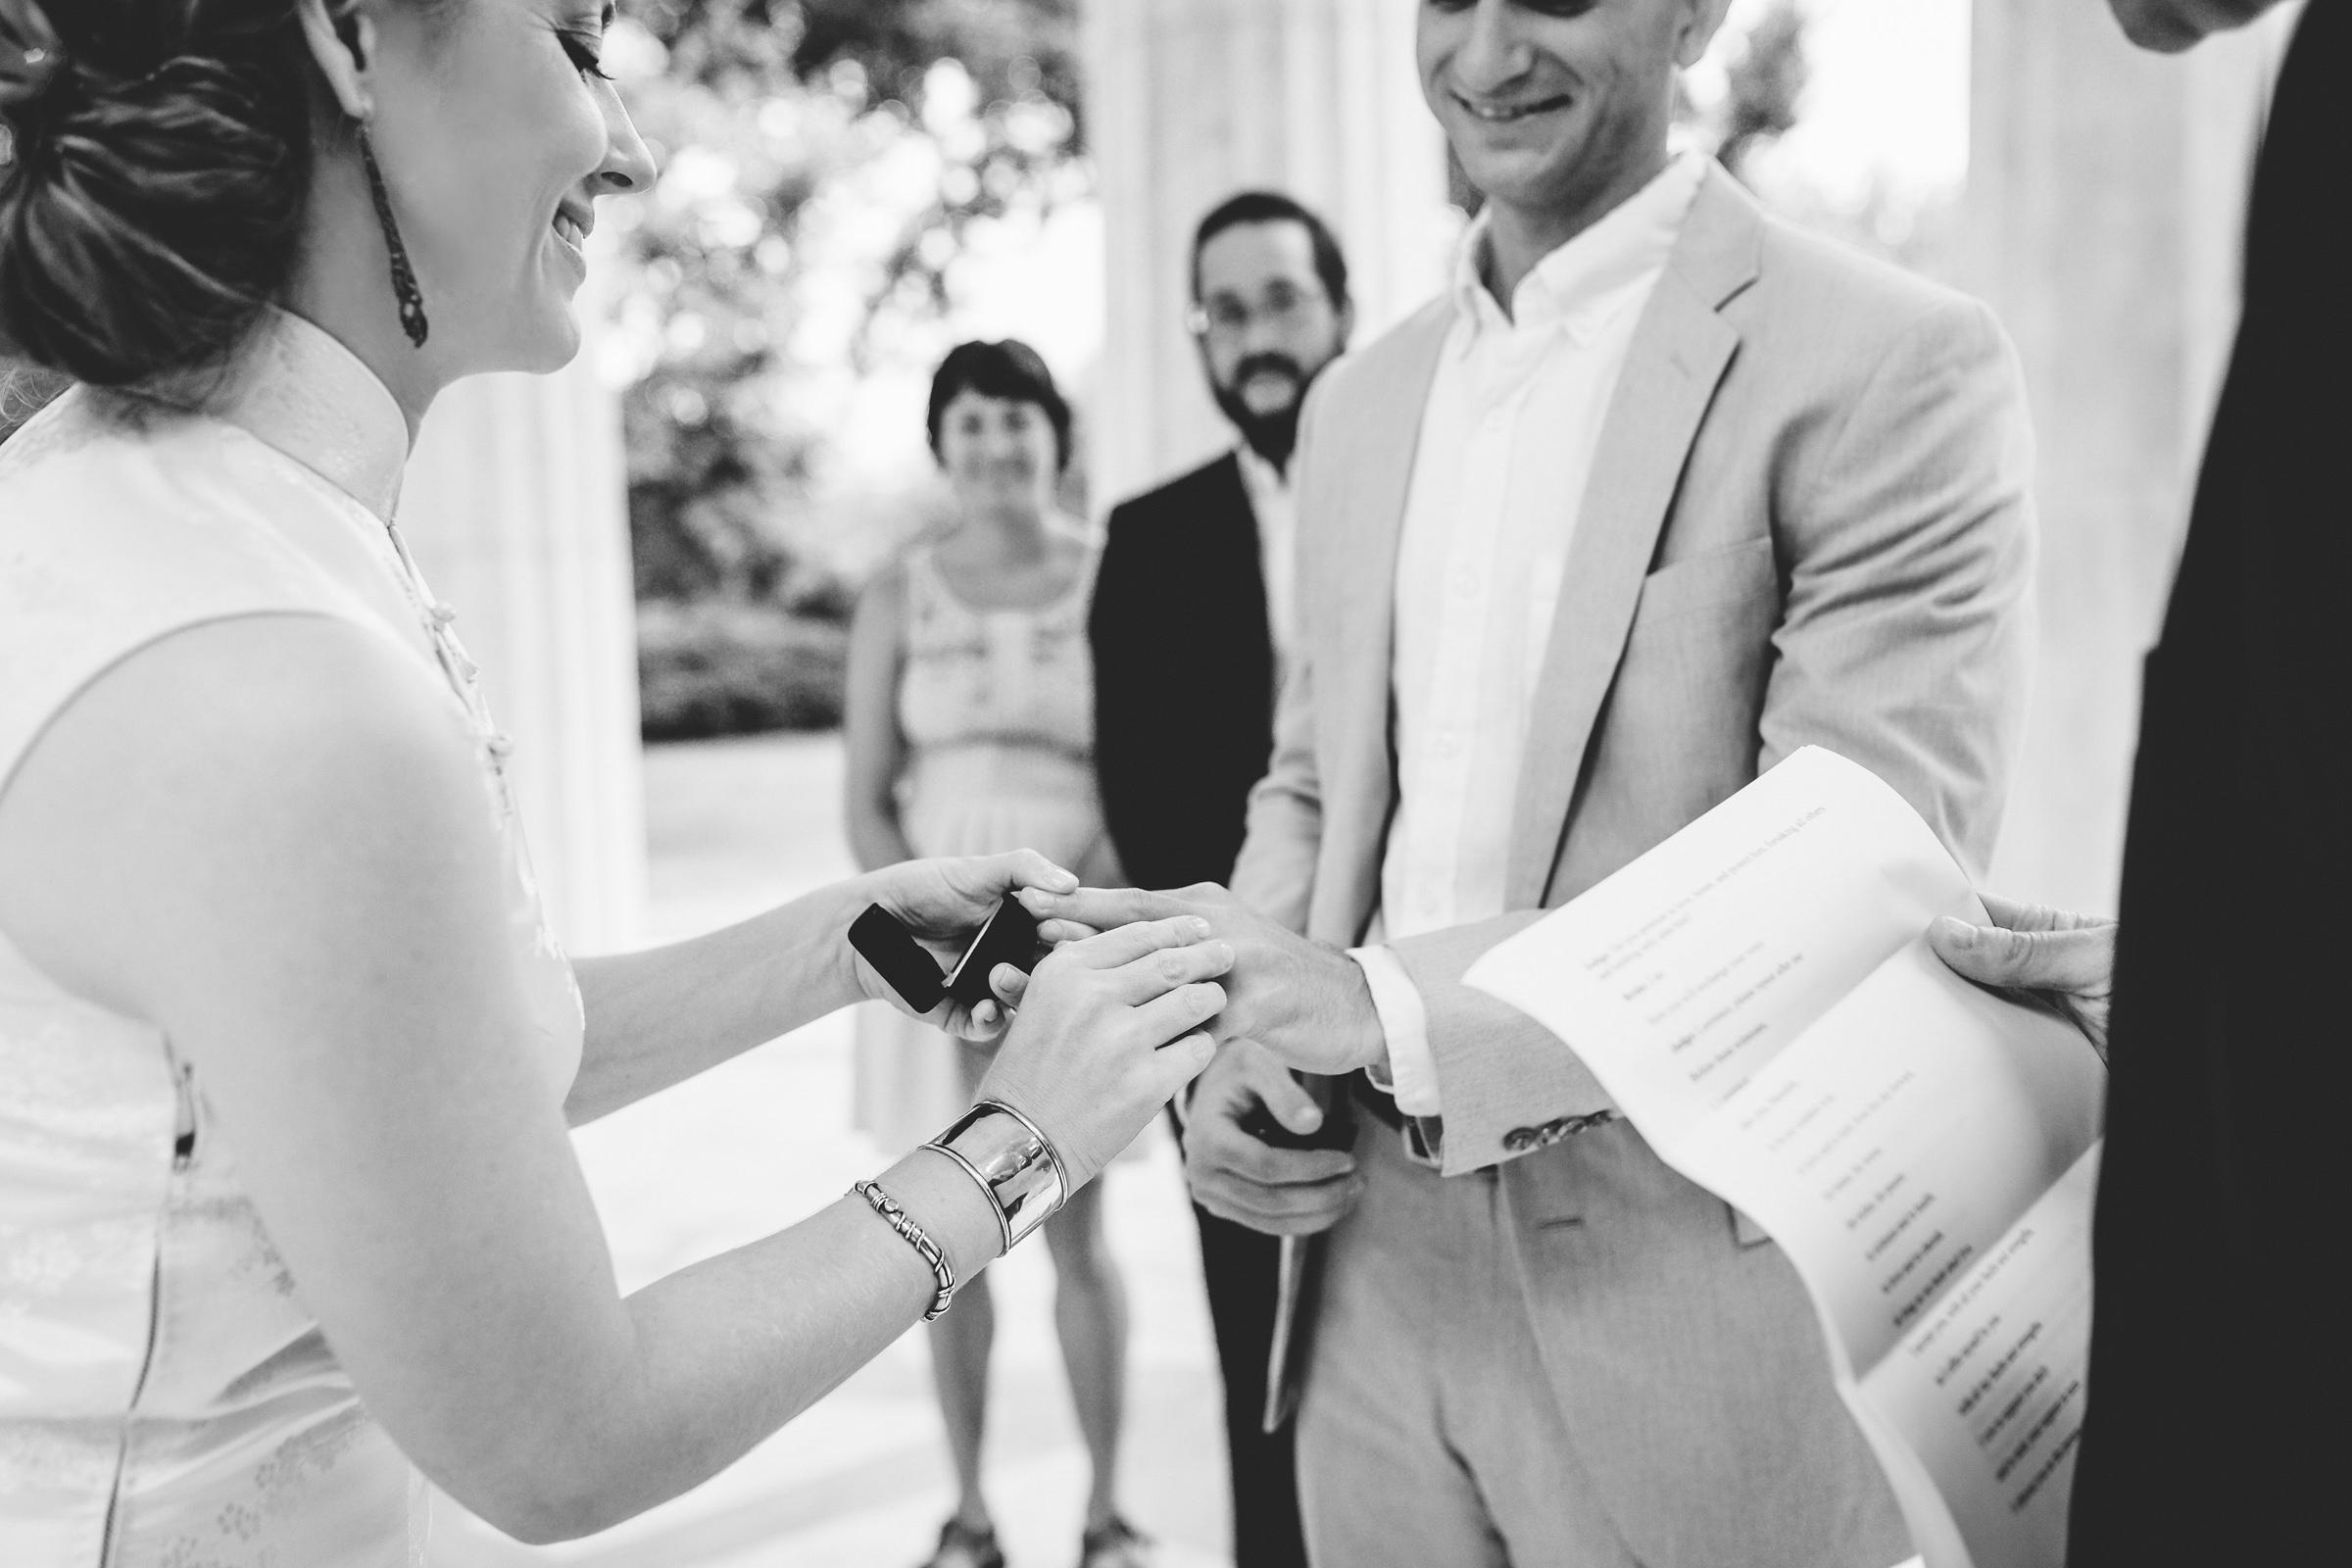 Kentucky_Candid_Wedding_Photographer_74.jpg